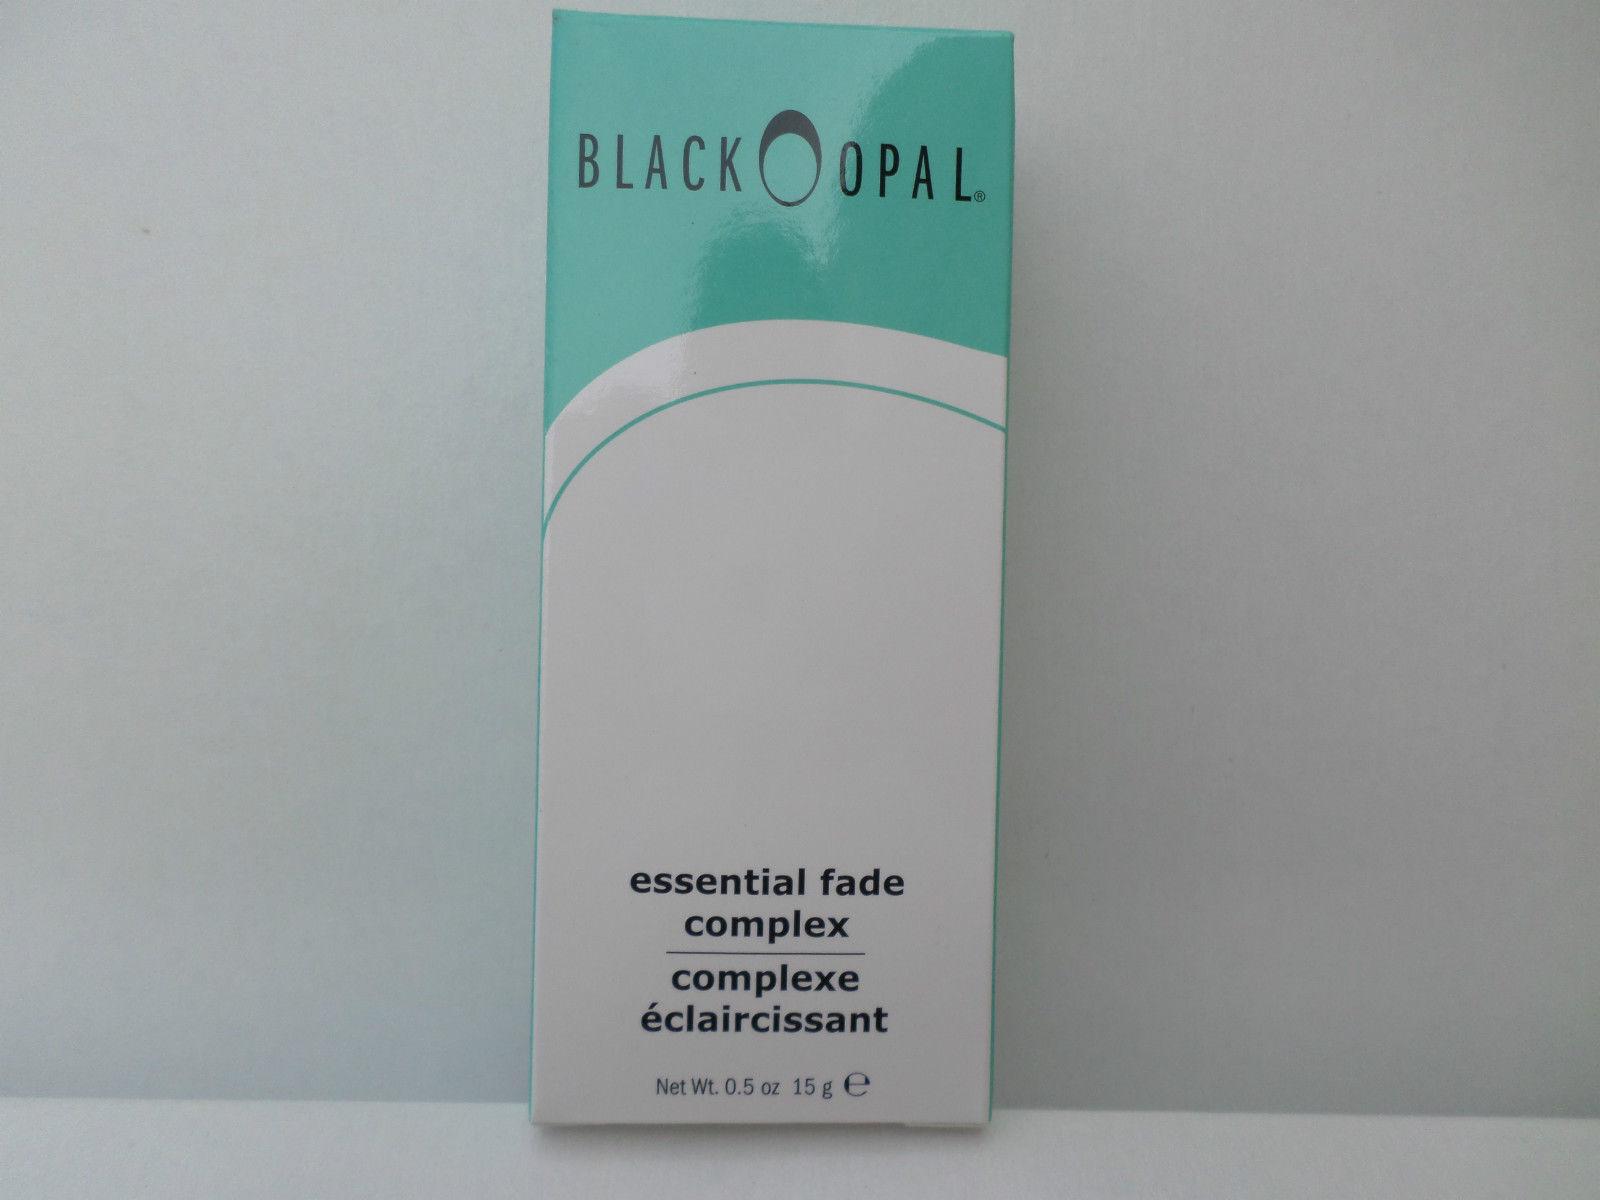 Black opal essential fade complex